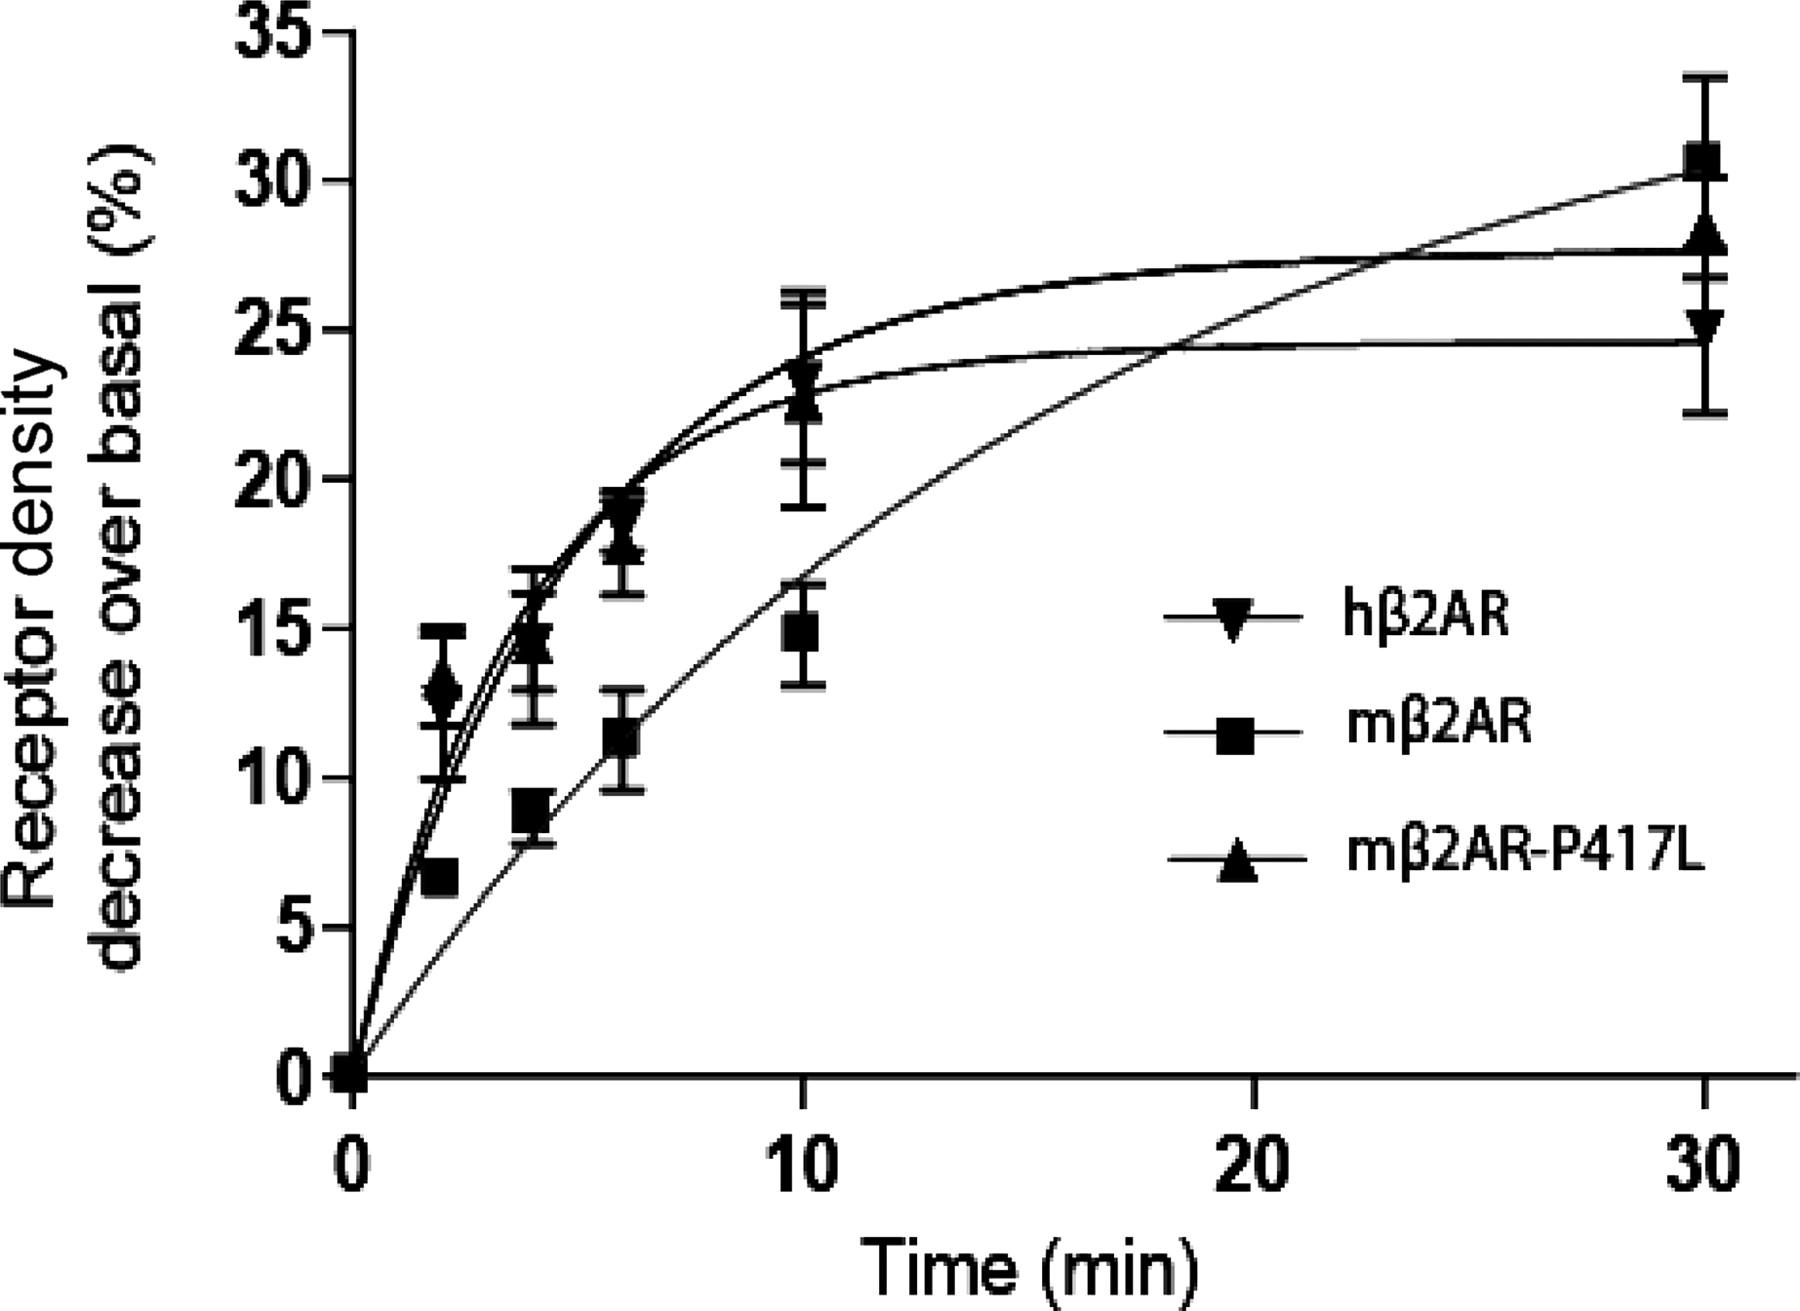 N-Ethylmaleimide-Sensitive Factor Regulates β2